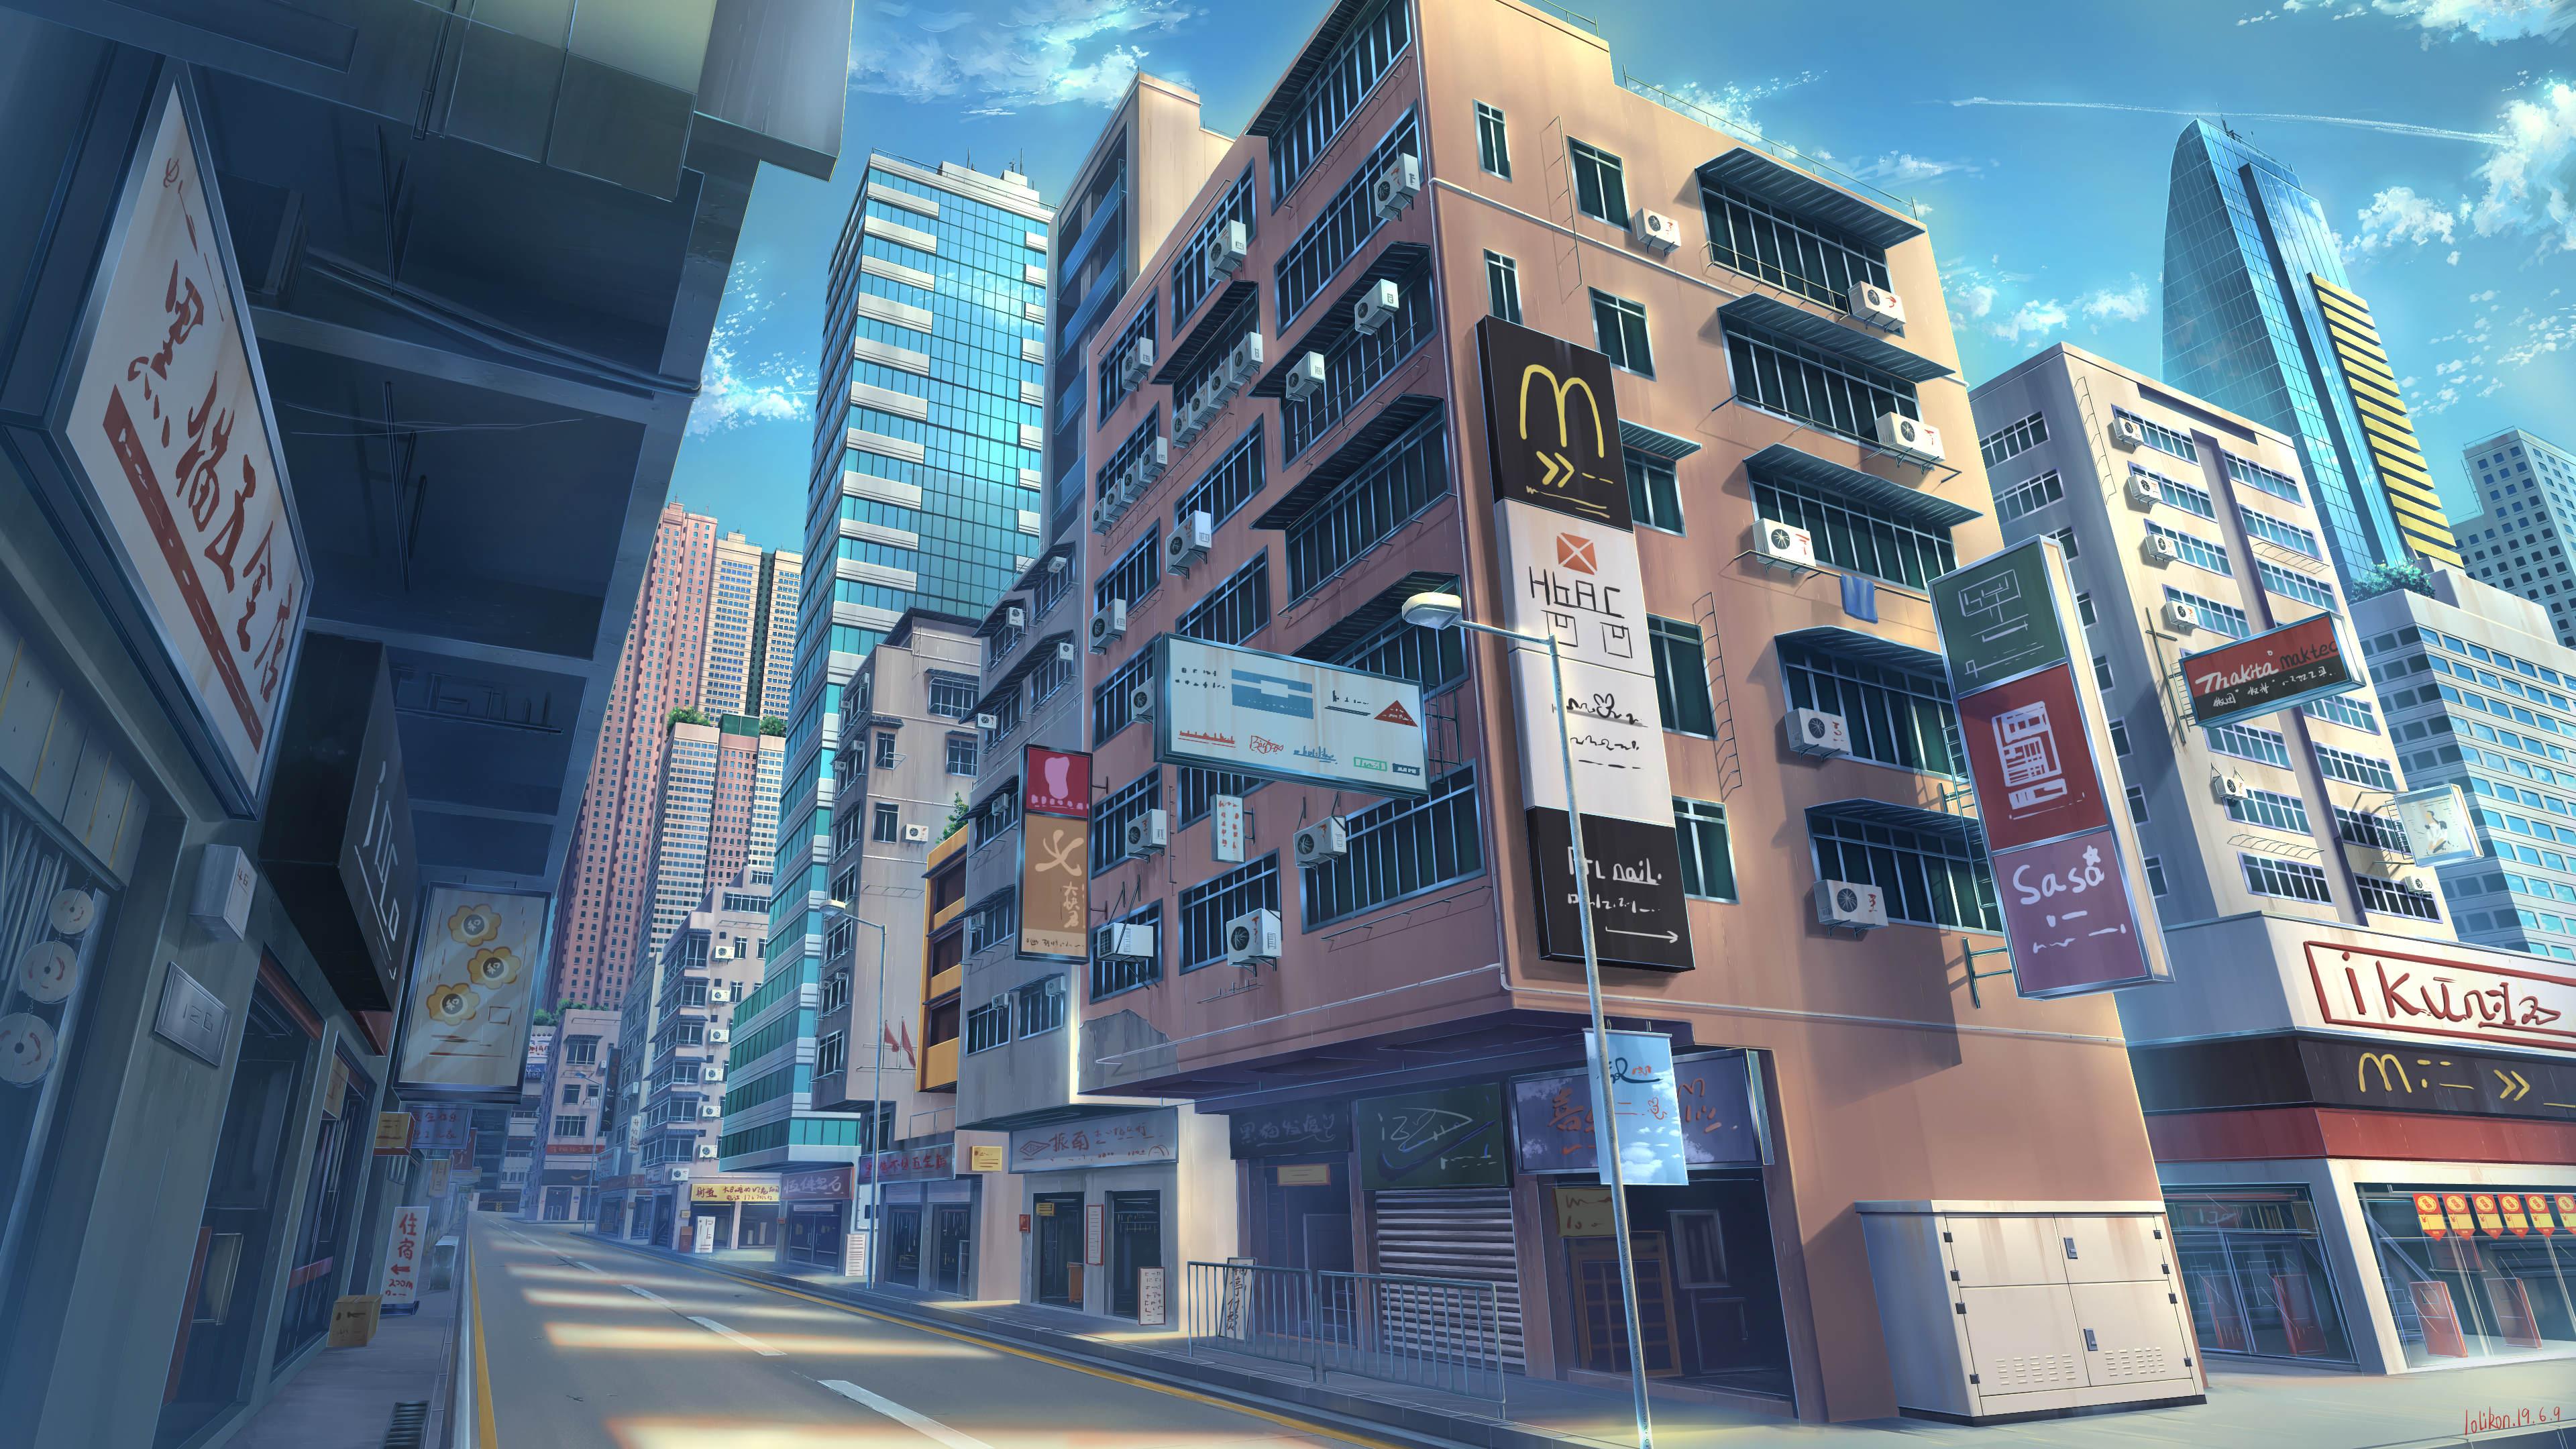 Wallpaper : anime, city 3840x2160 - rudrachl - 1659055 ...